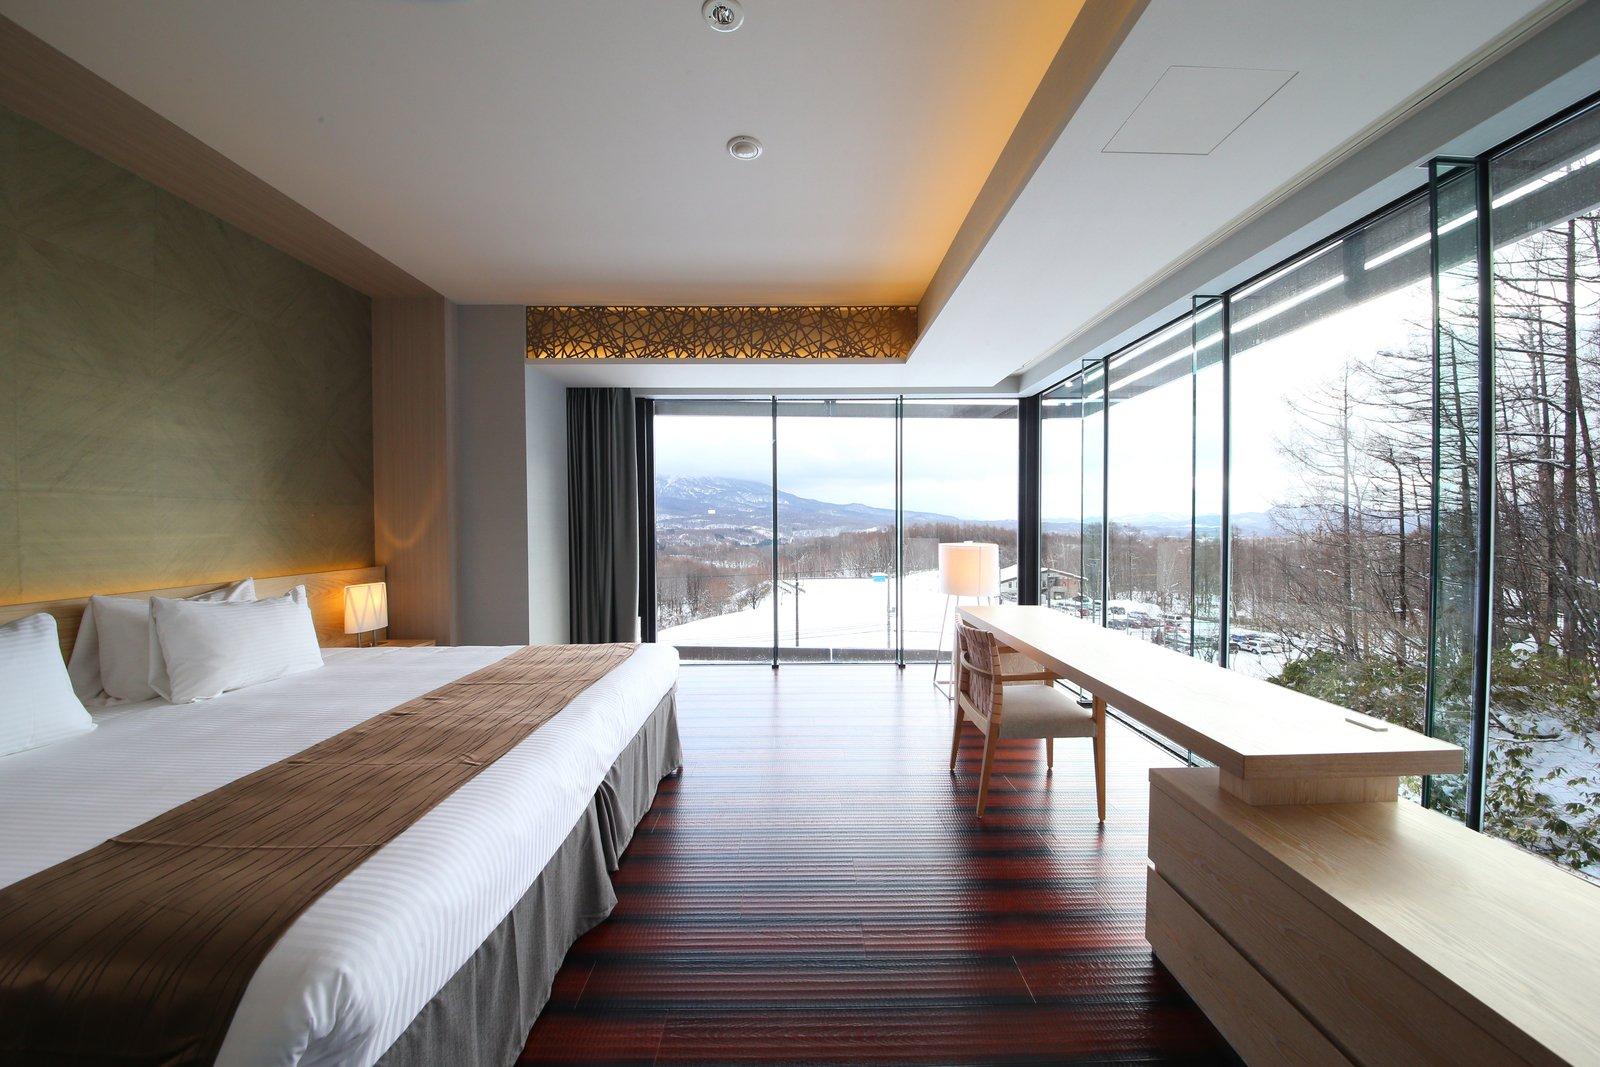 3 bedroom 7 large